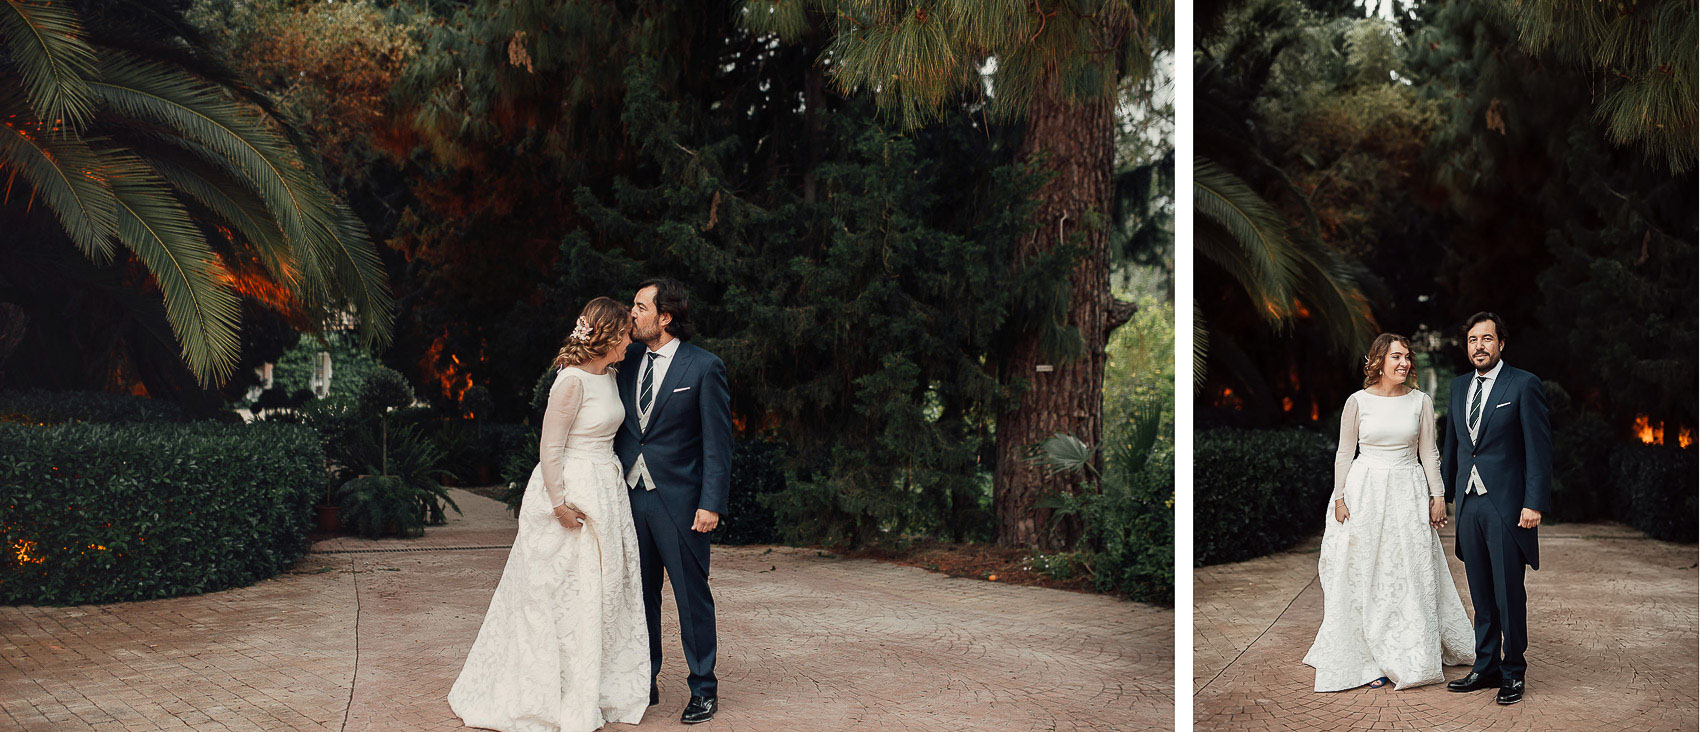 fotografia boda novios pareja casados parque de la marquesa naturaleza